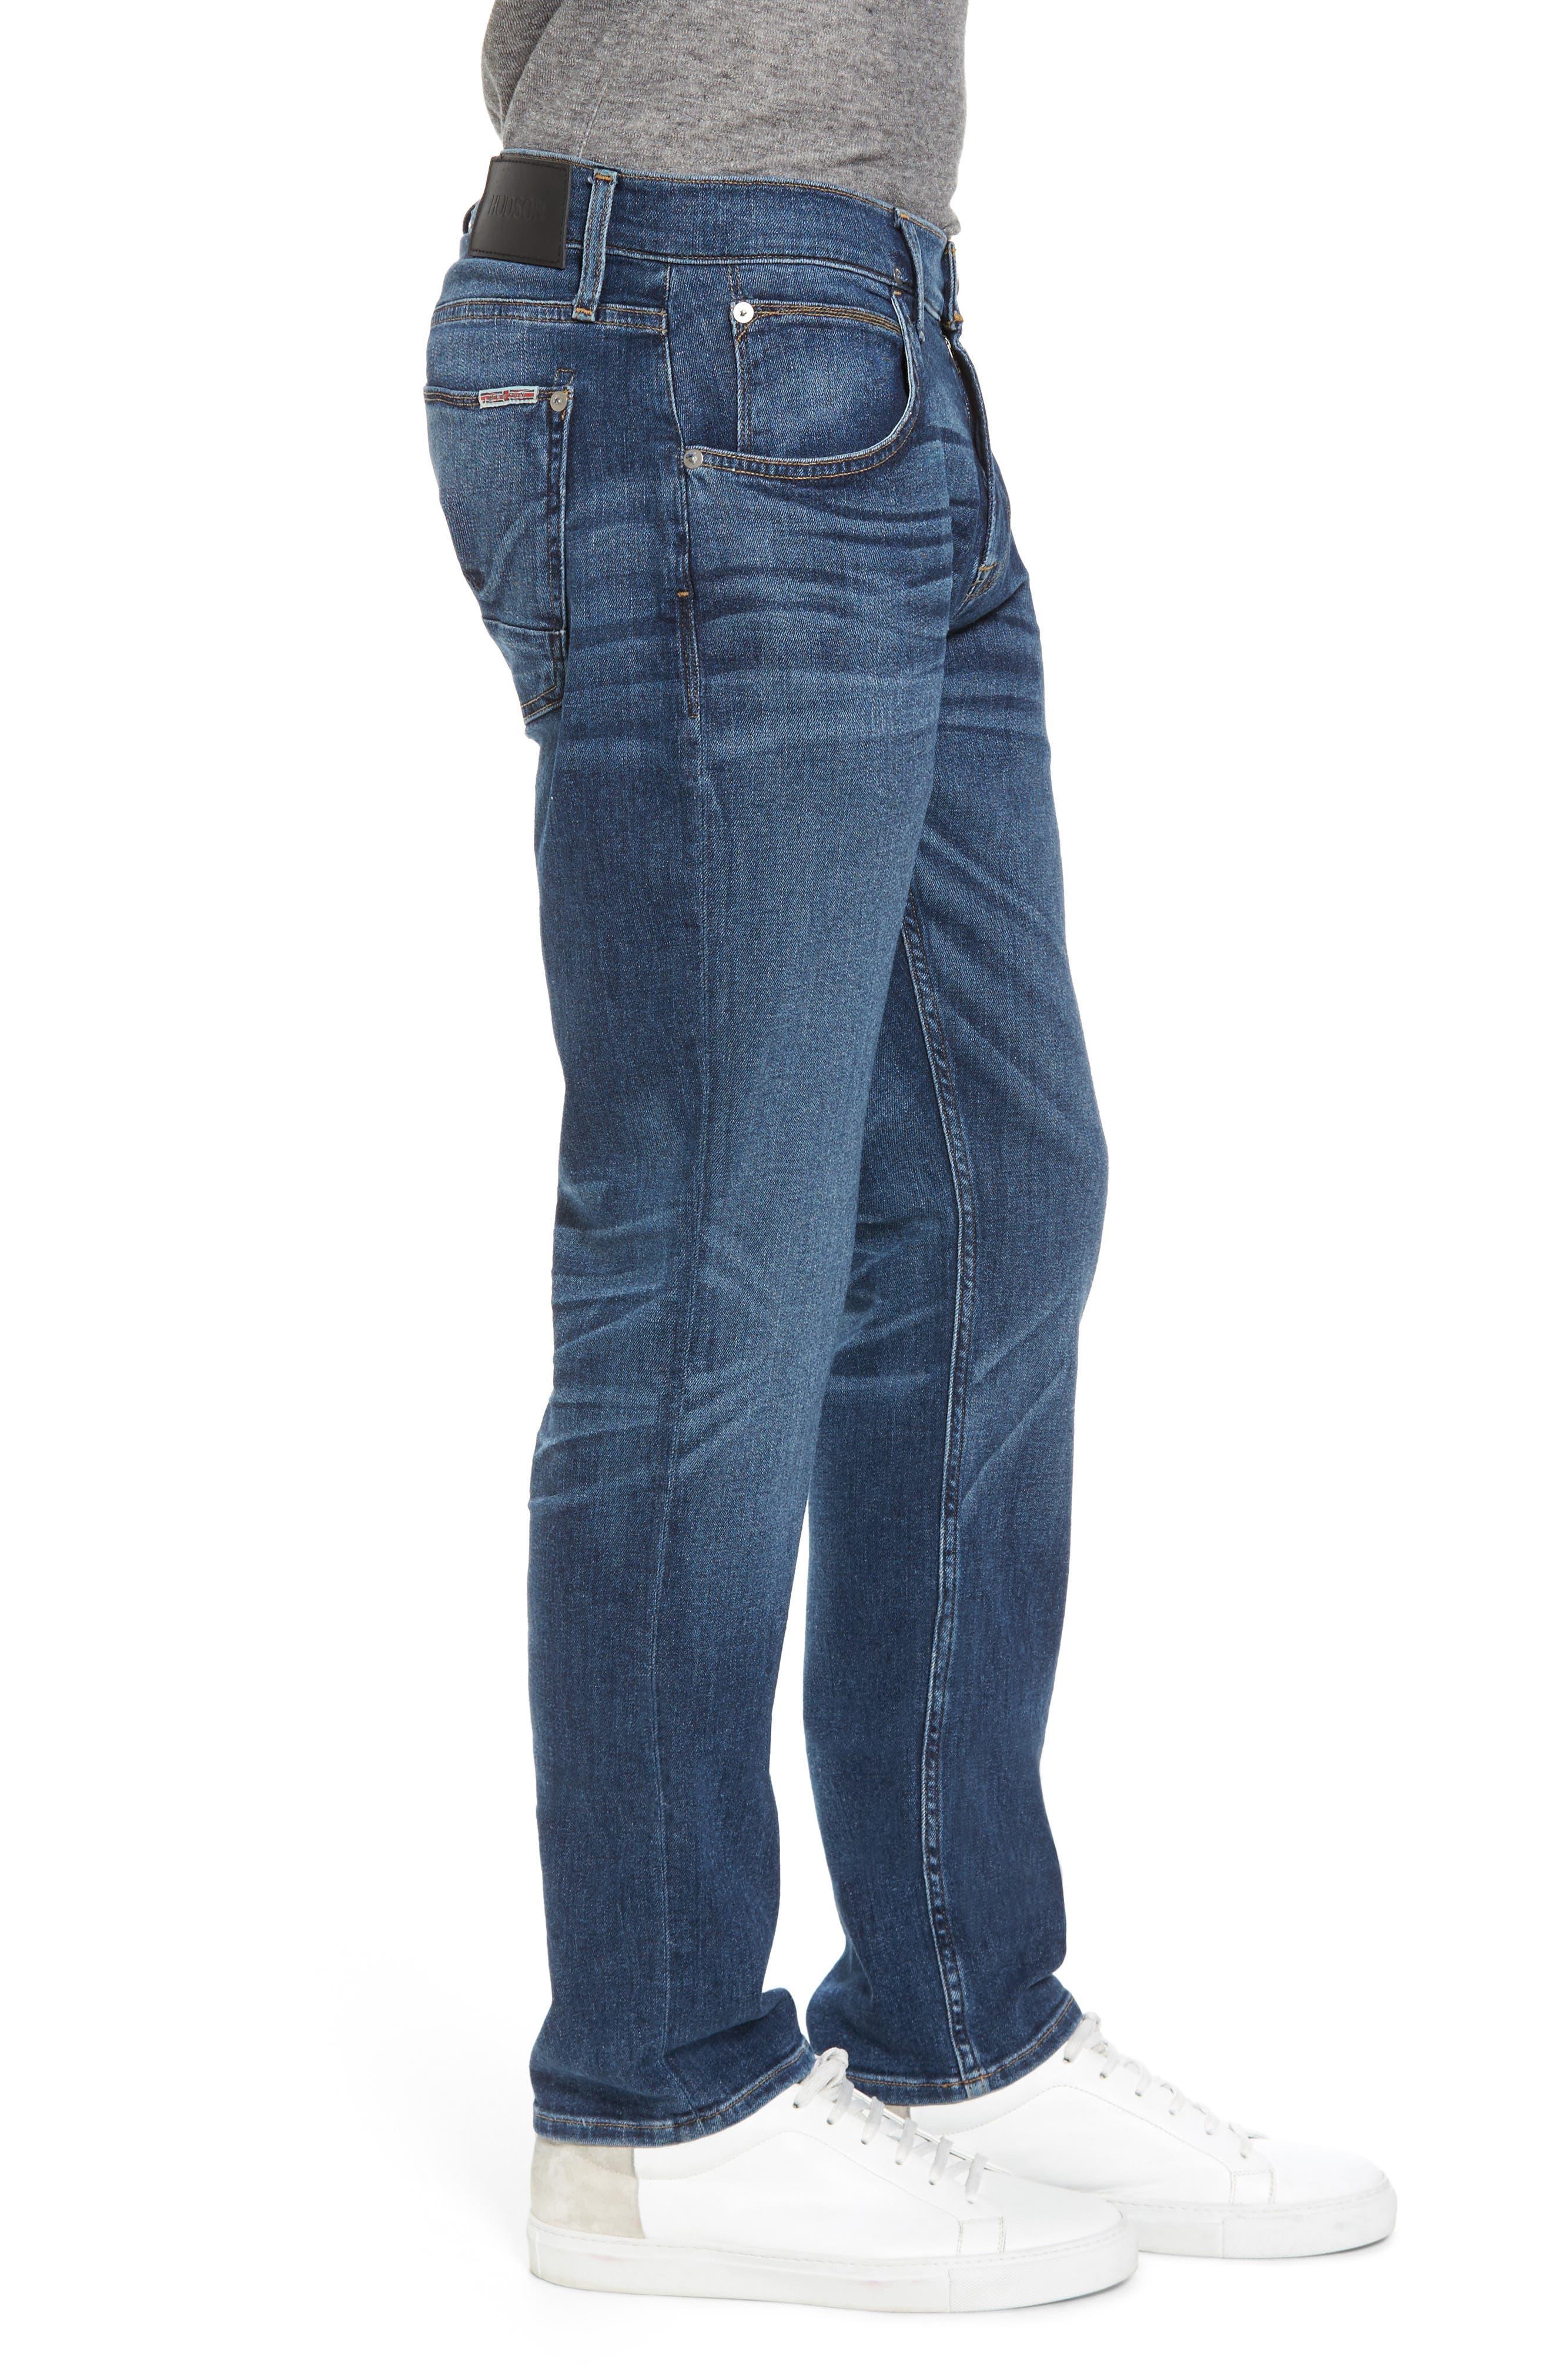 Blake Slim Fit Jeans,                             Alternate thumbnail 3, color,                             Calloway